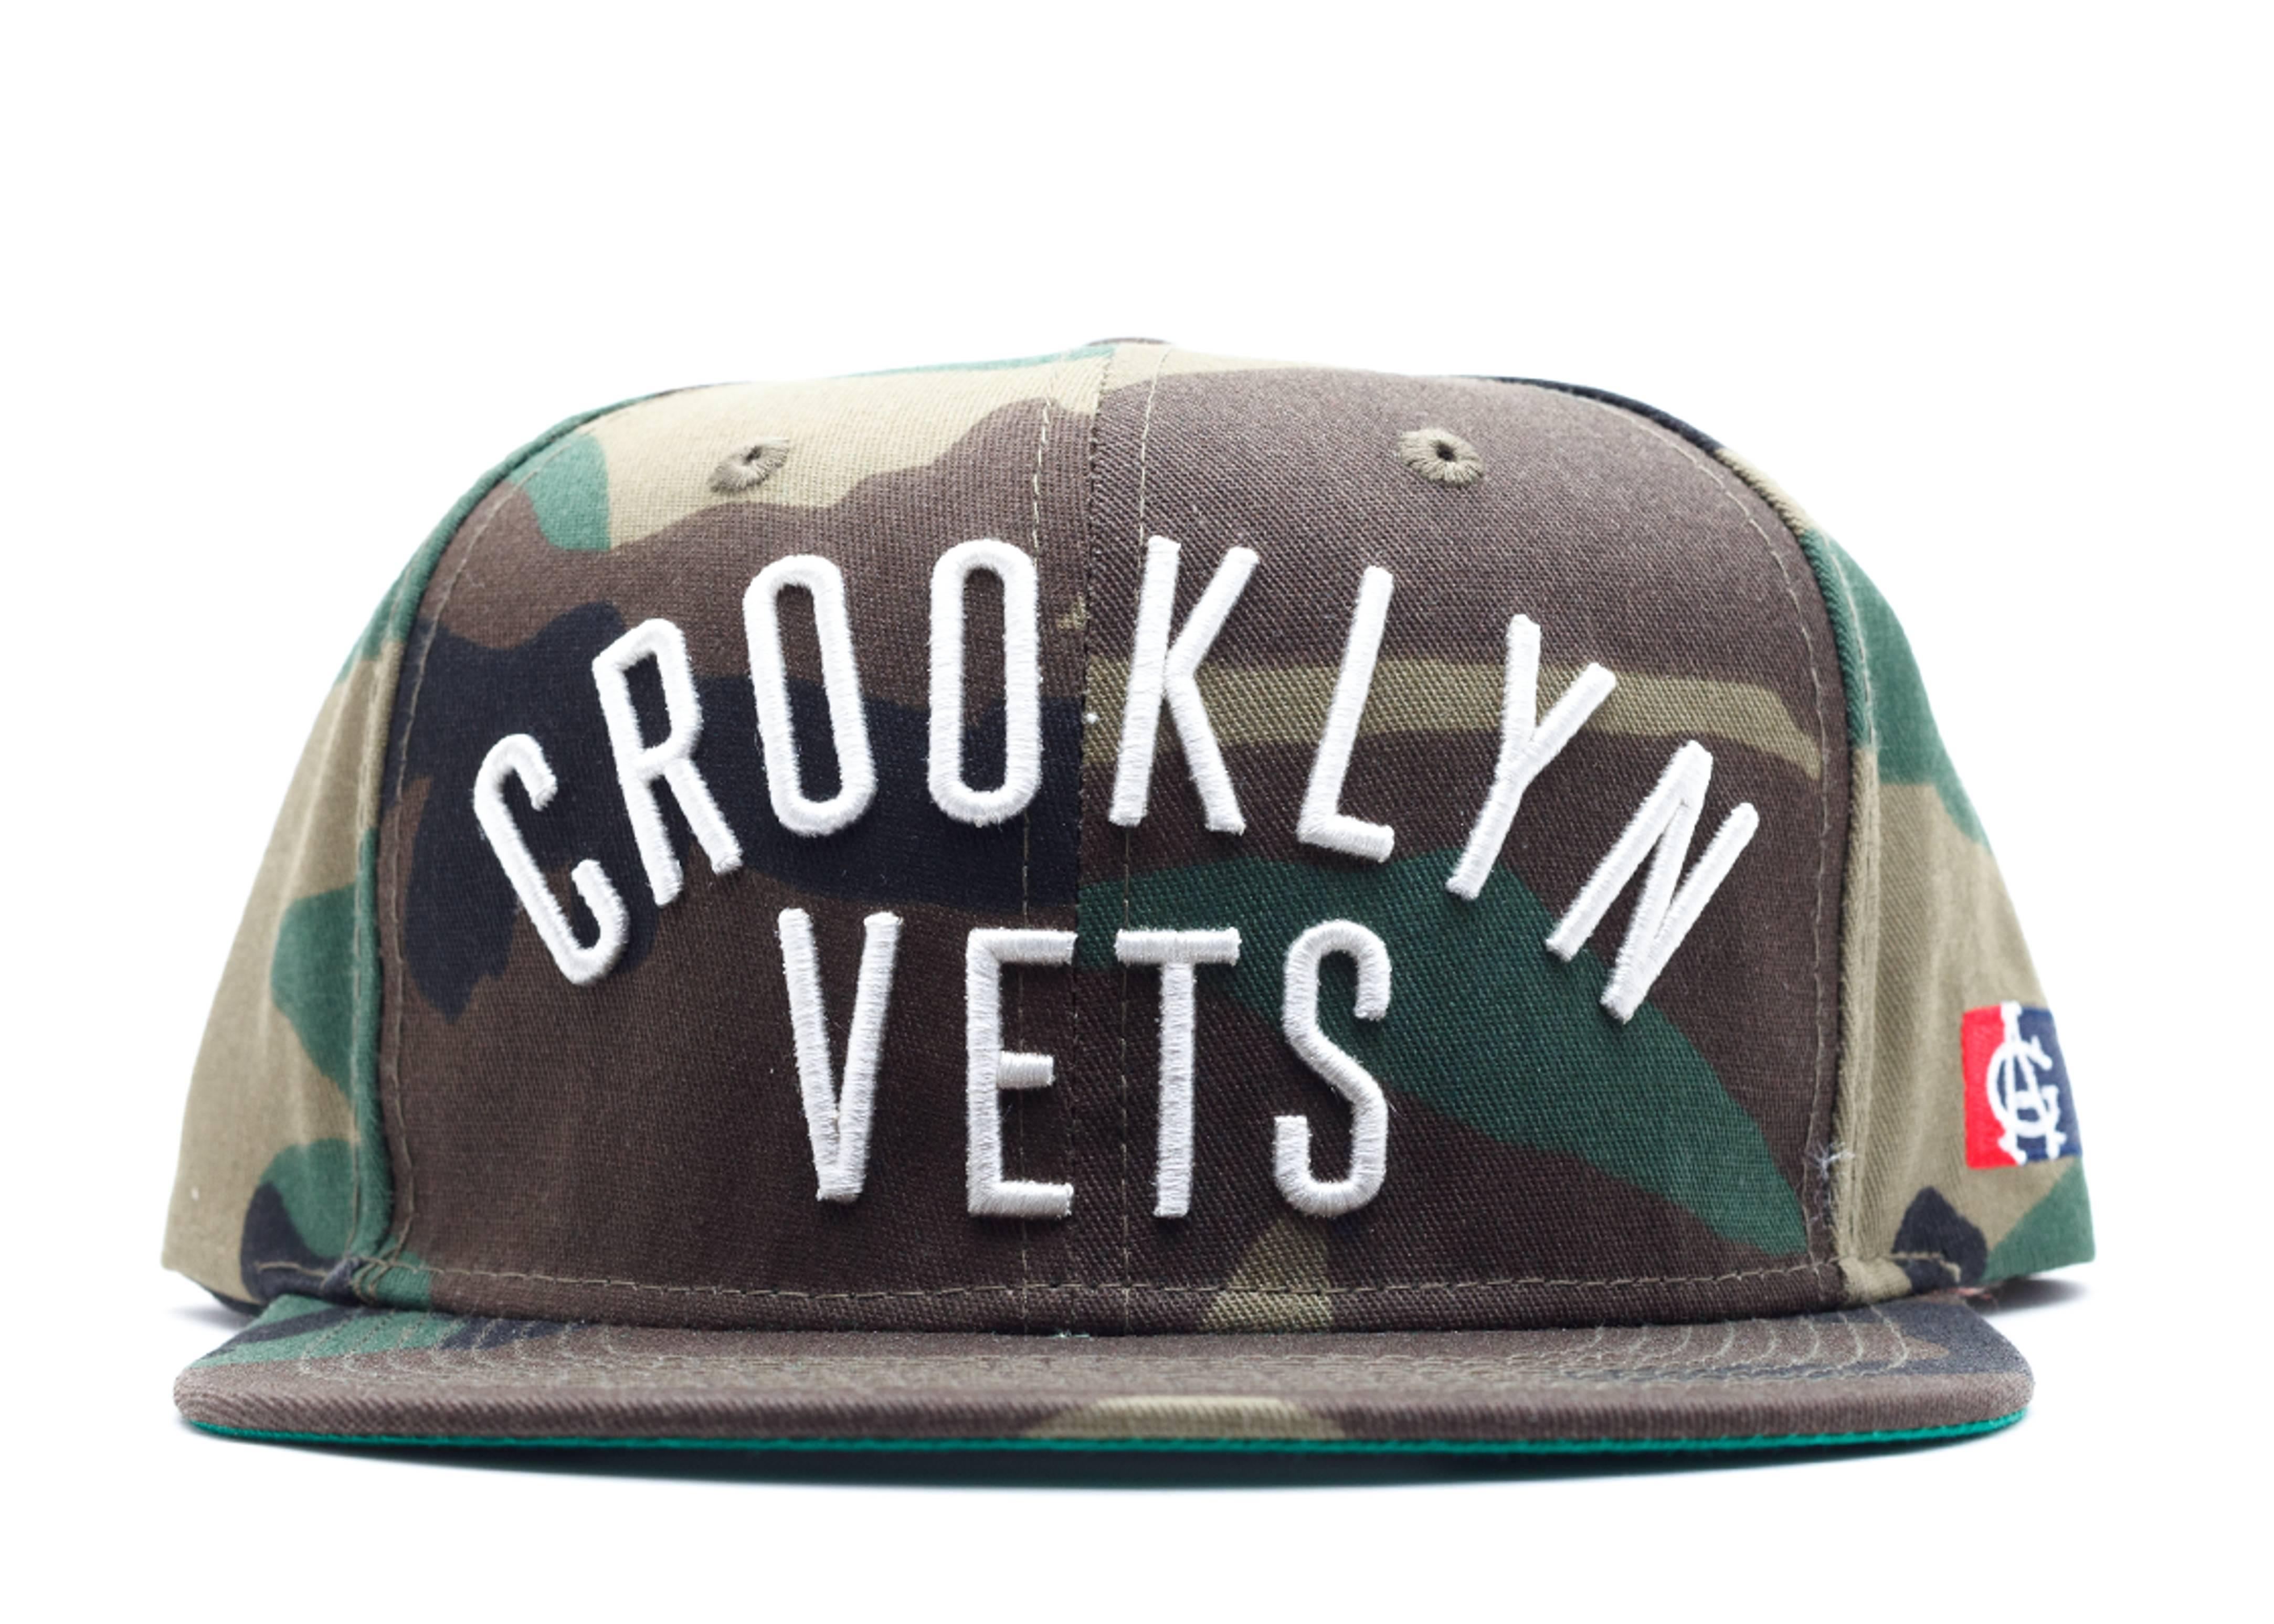 crooklyn vets snap-back